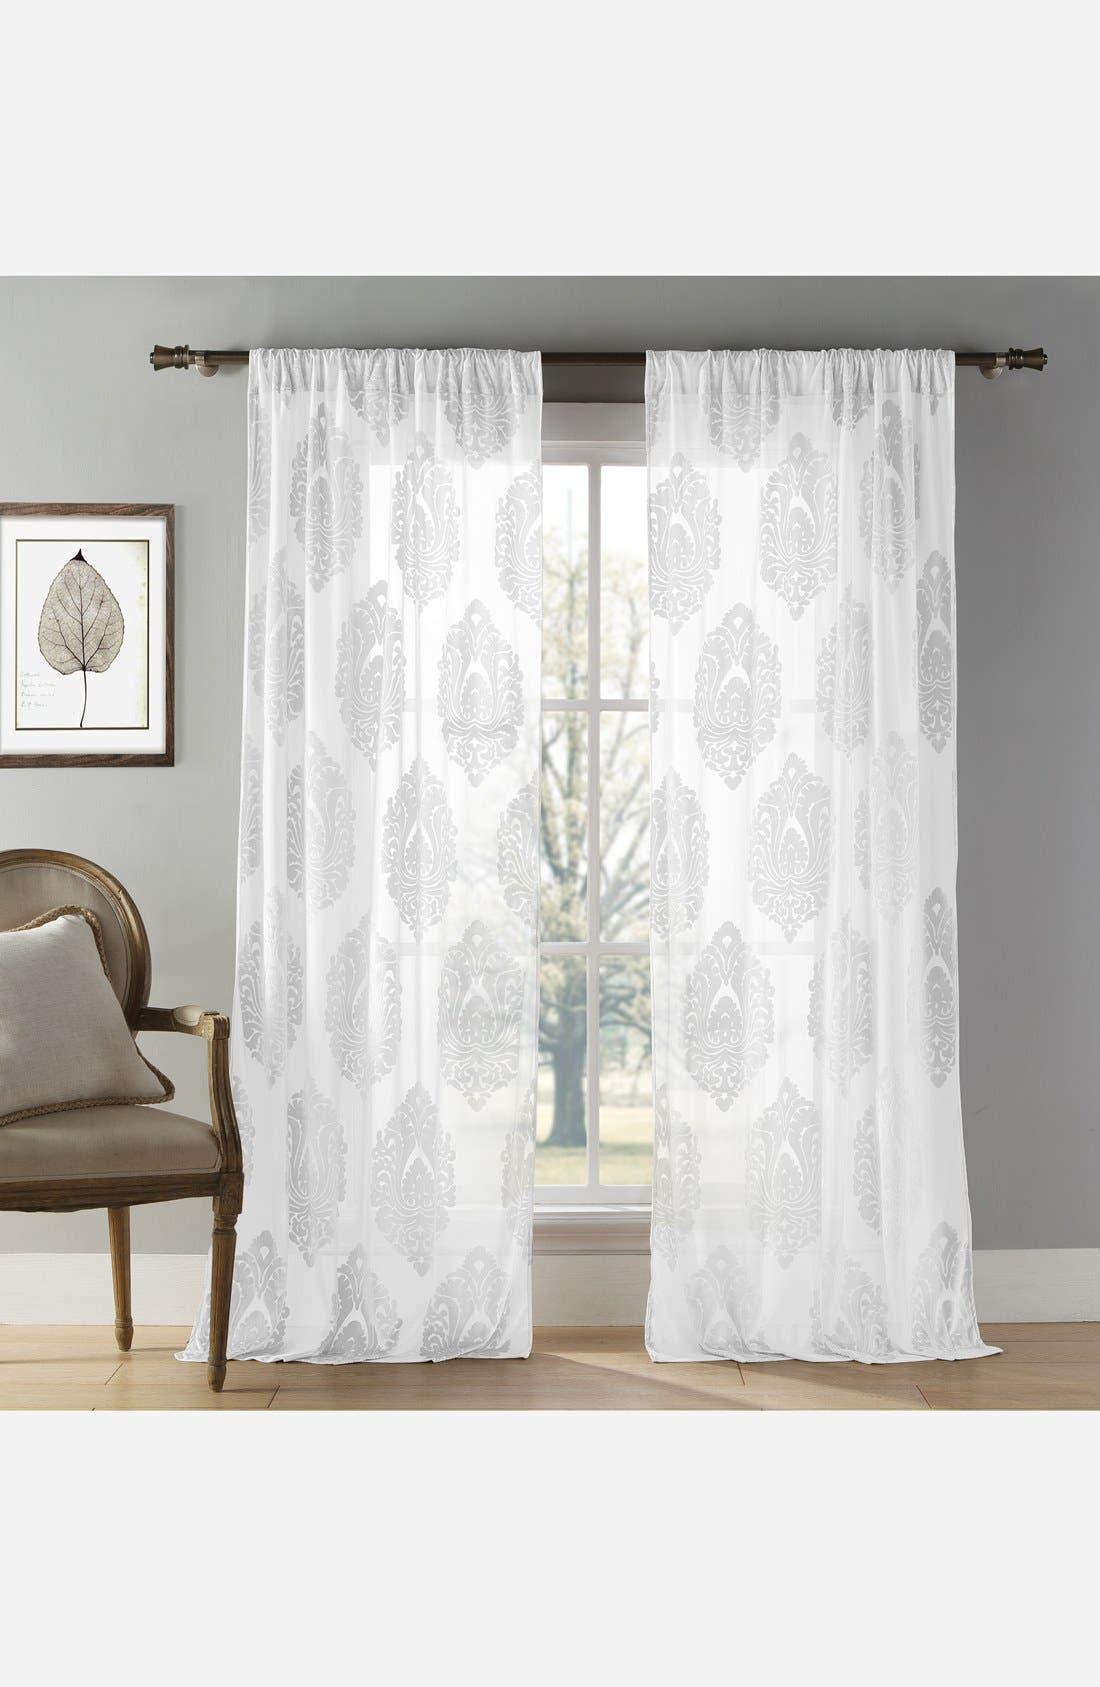 Main Image - Duck River Textile 'Sophie' Damask Velvet Burnout Window Panels (Set of 2)